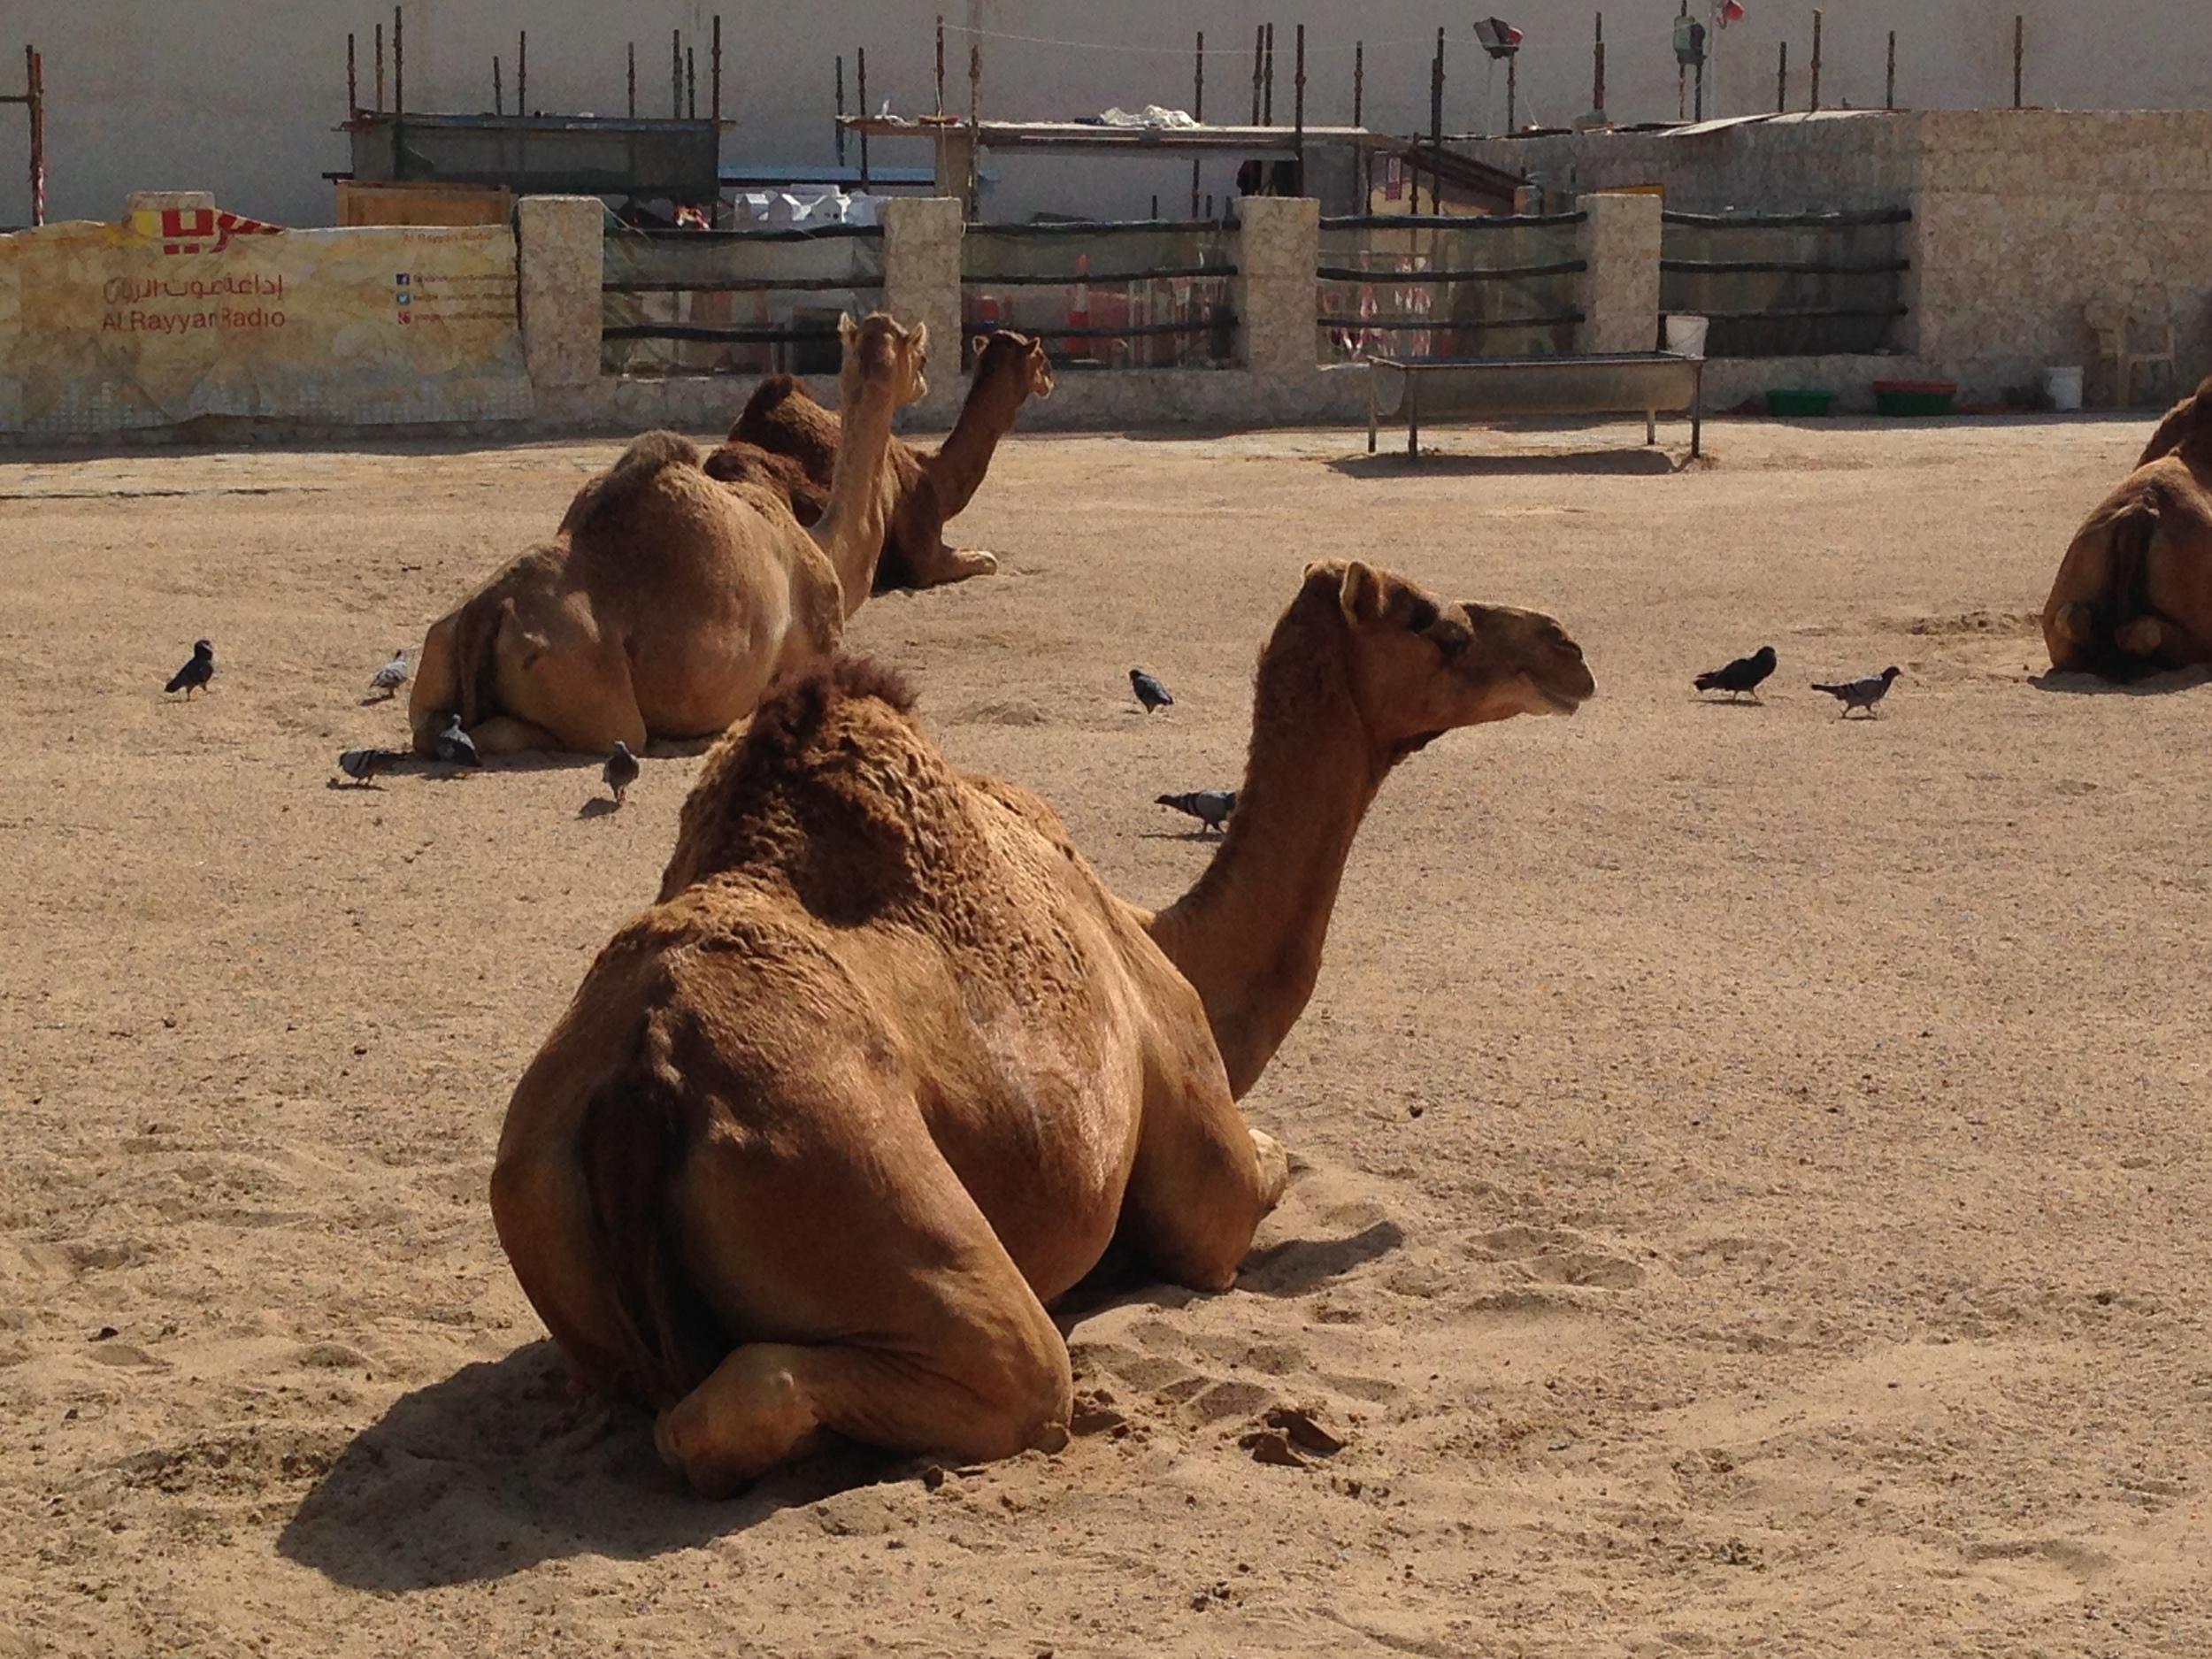 Camels in Souq Waquif